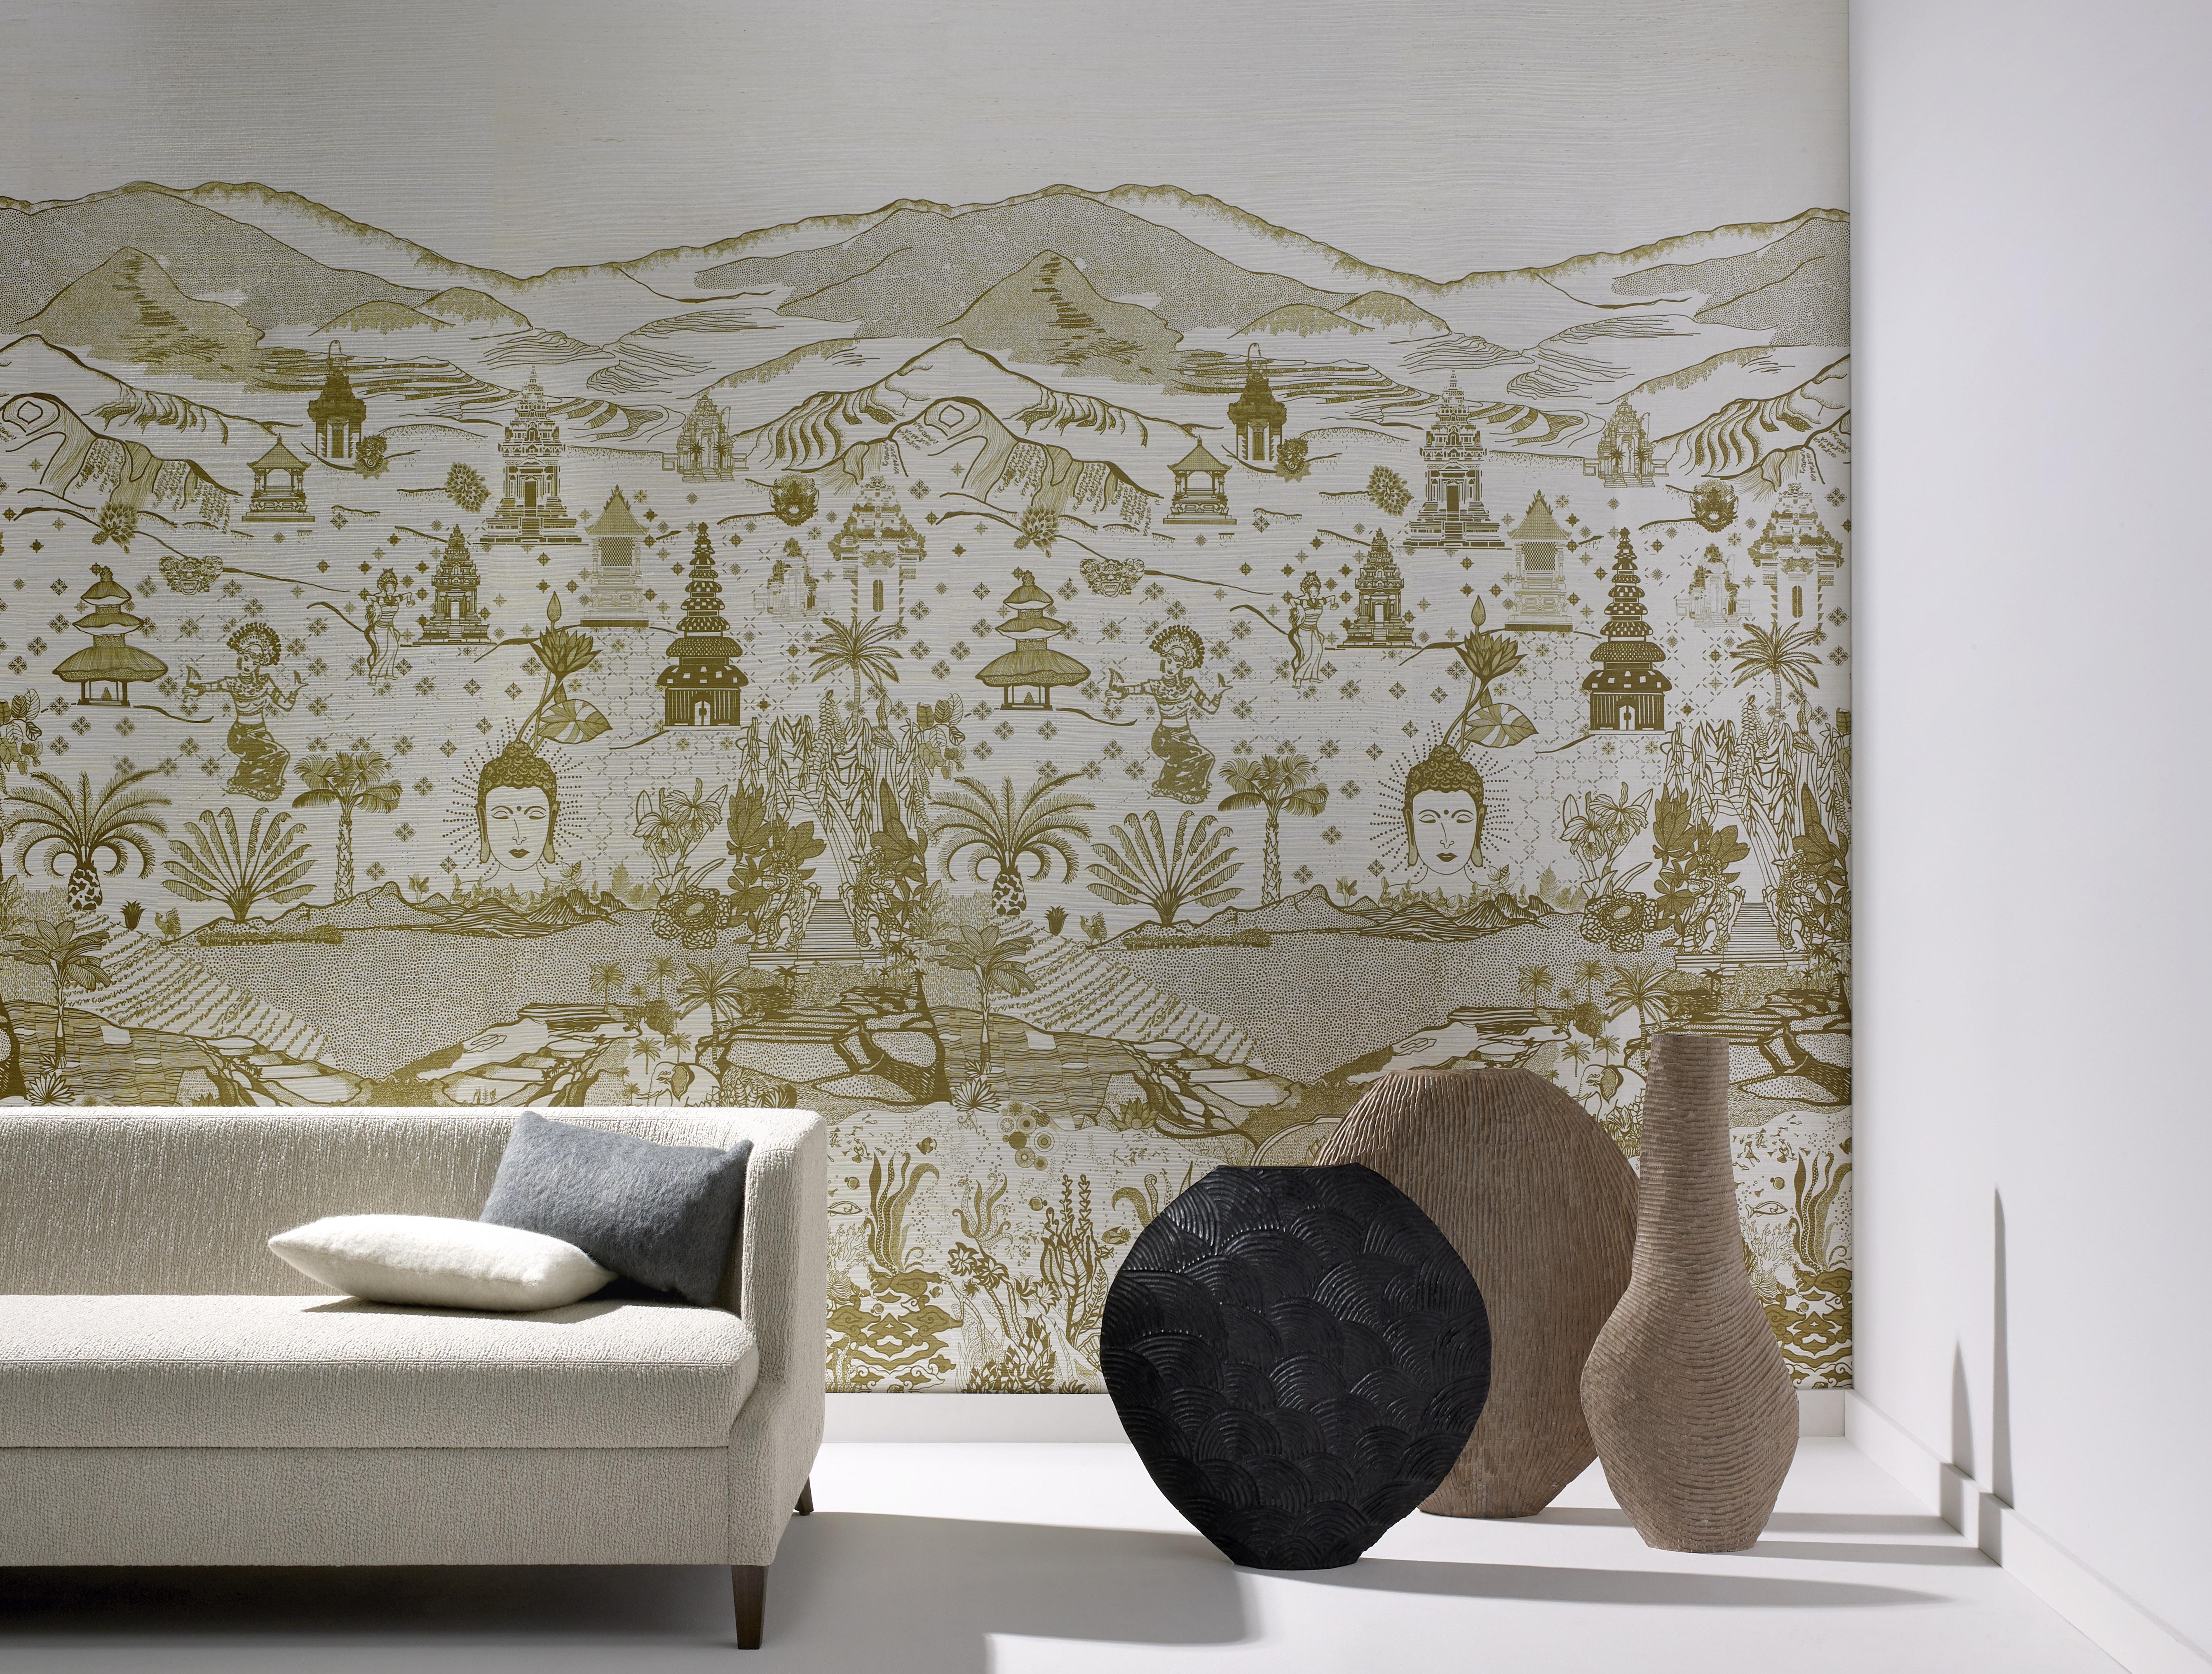 Pierre Frey Parisian Chic Wallpapers London Wallpaper Company